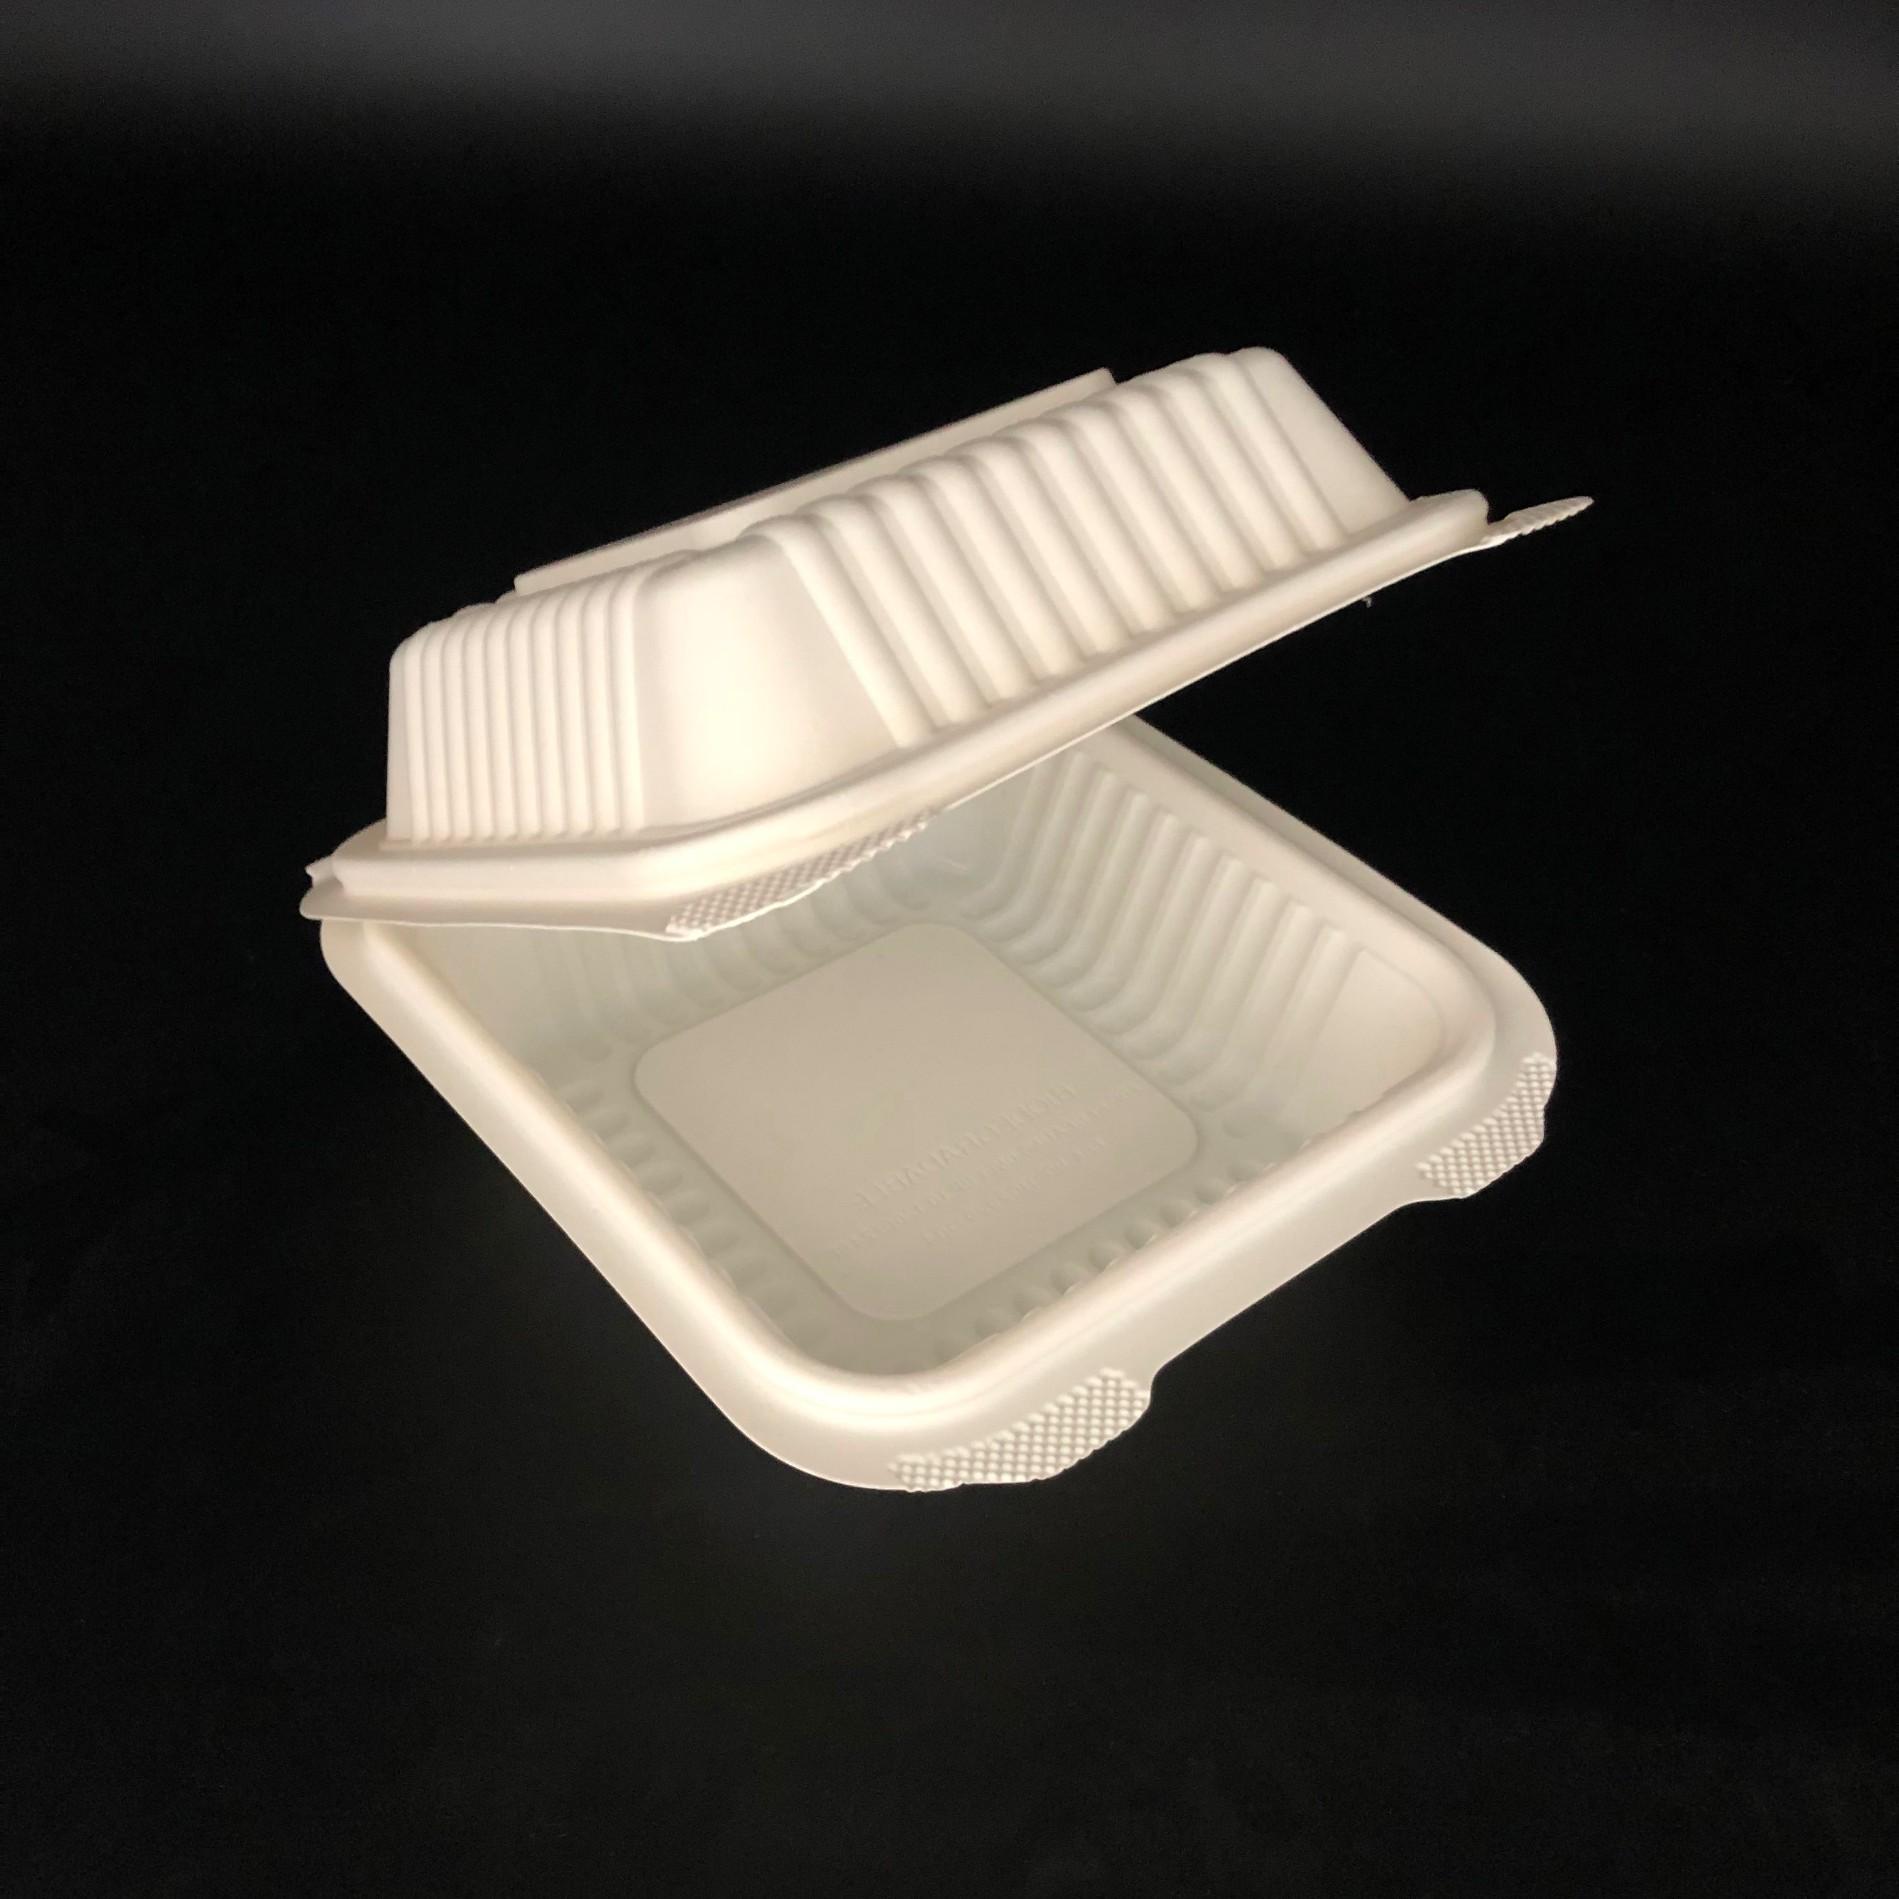 biodegradable corn starch/PLA take away food container Manufacturers, biodegradable corn starch/PLA take away food container Factory, Supply biodegradable corn starch/PLA take away food container